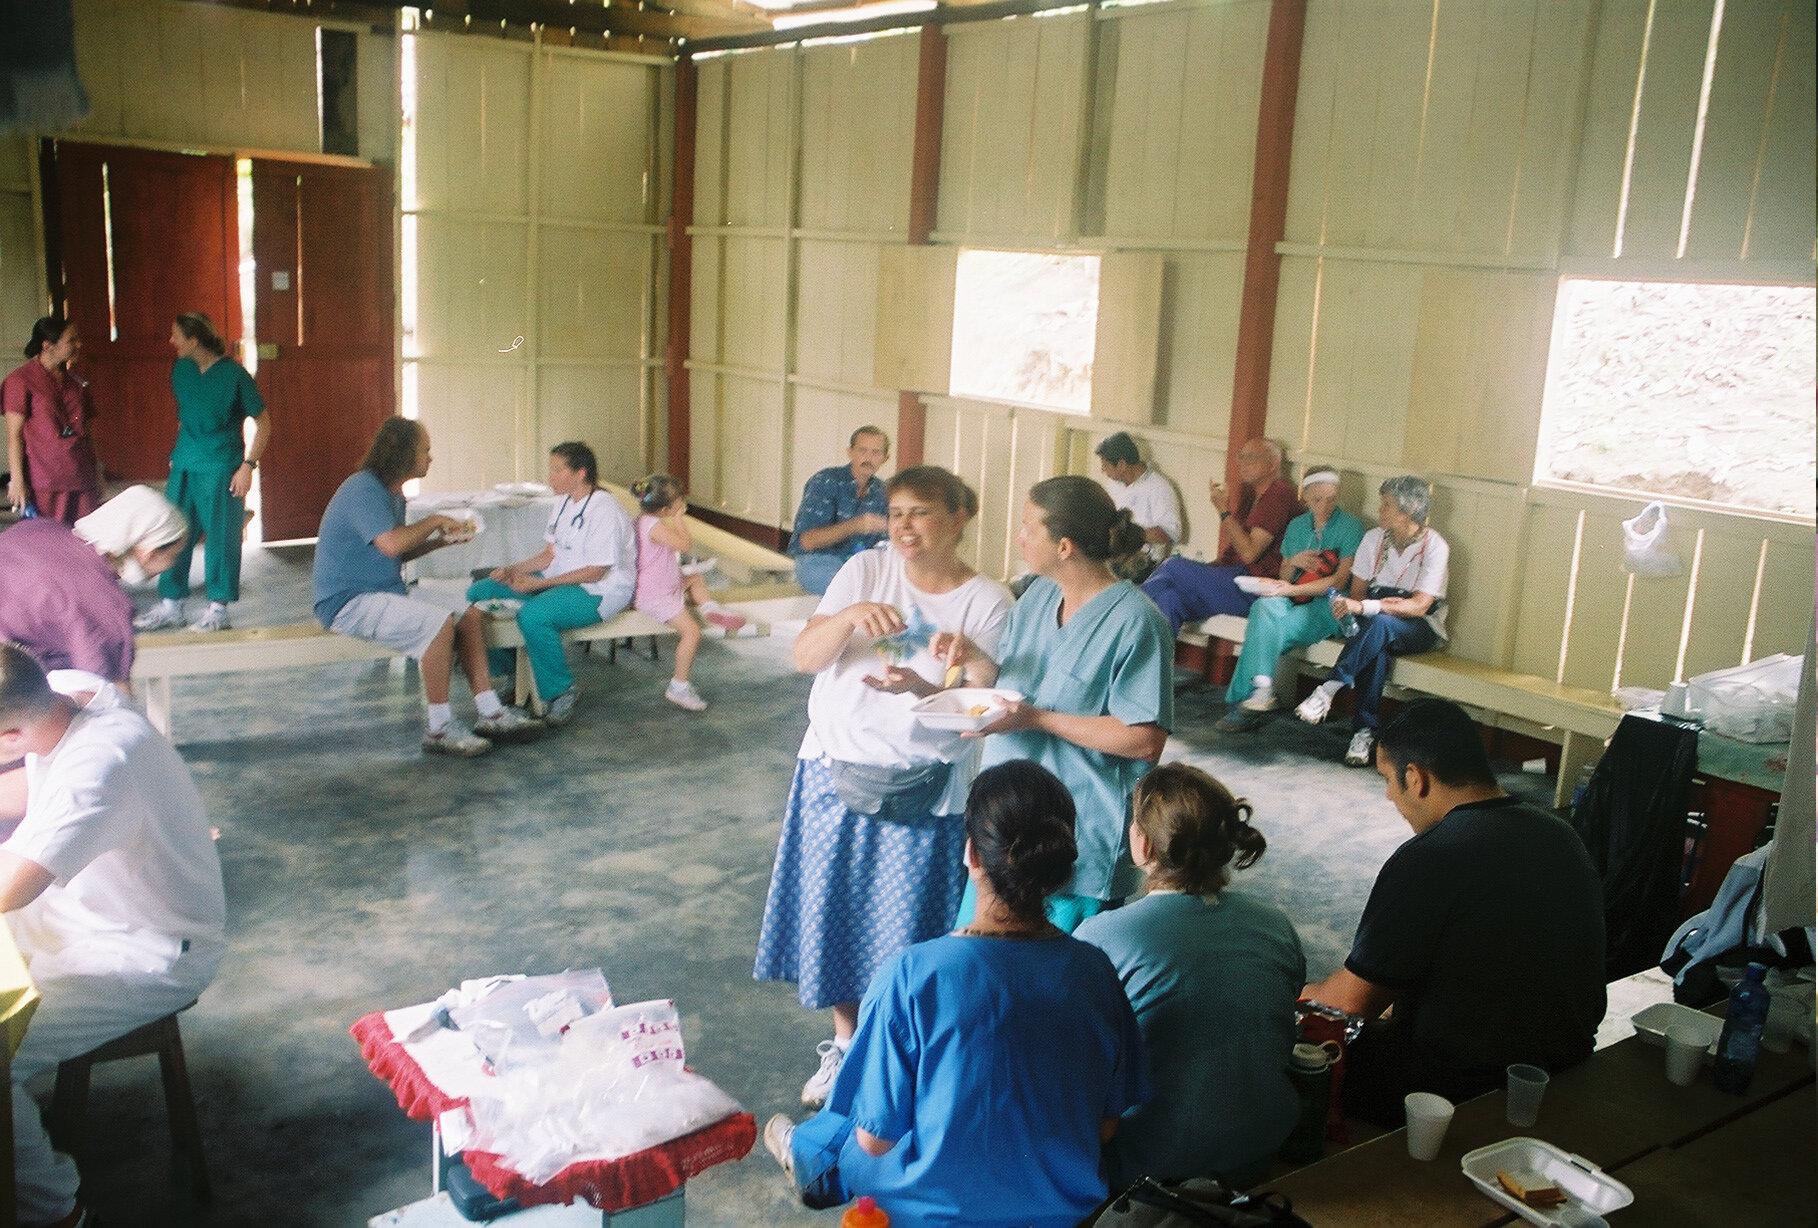 clinic 4 lunch.jpg